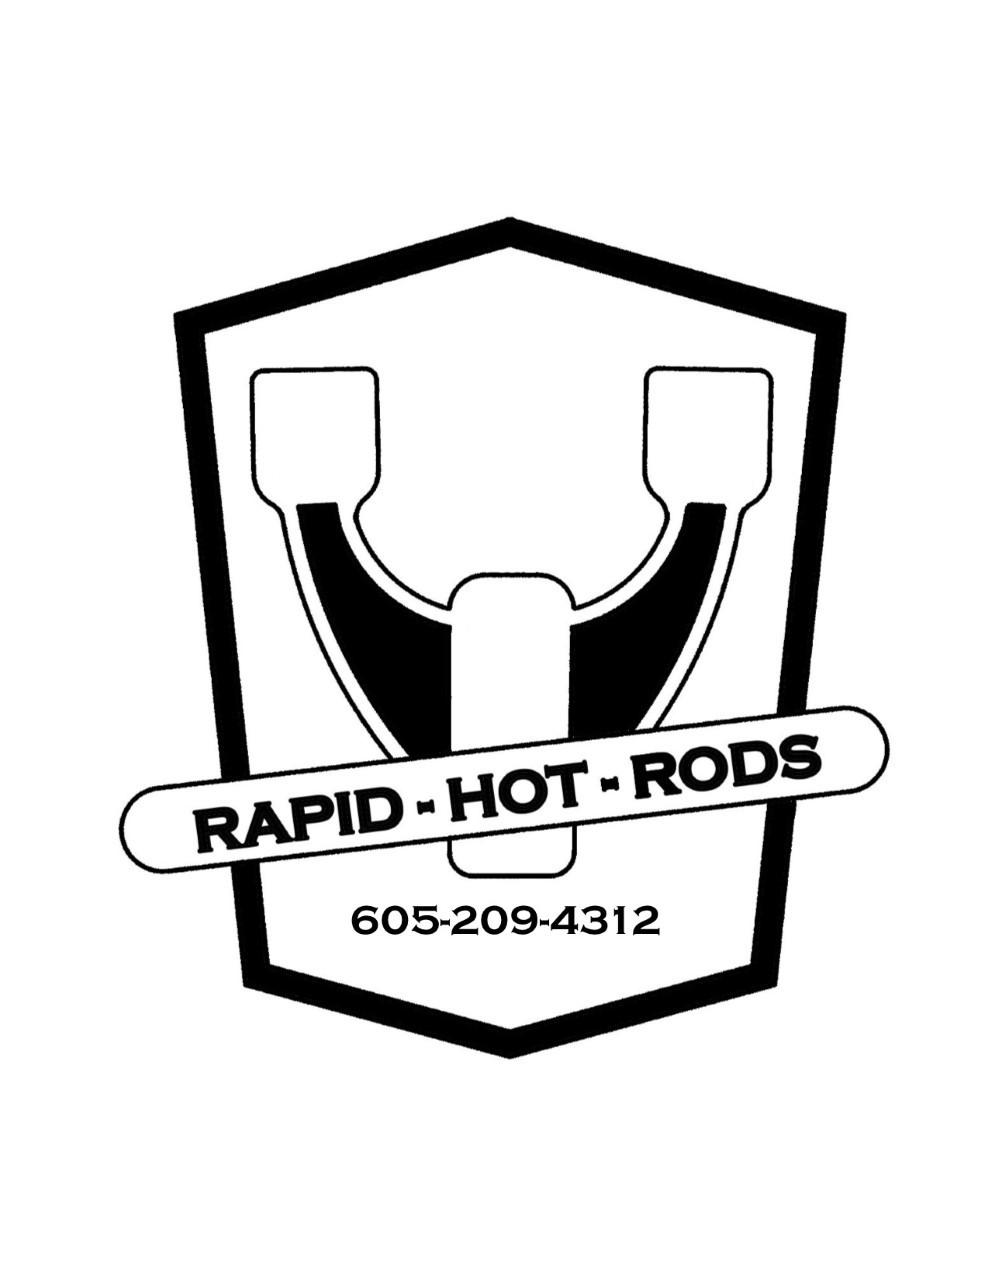 Rapid Hot Rods